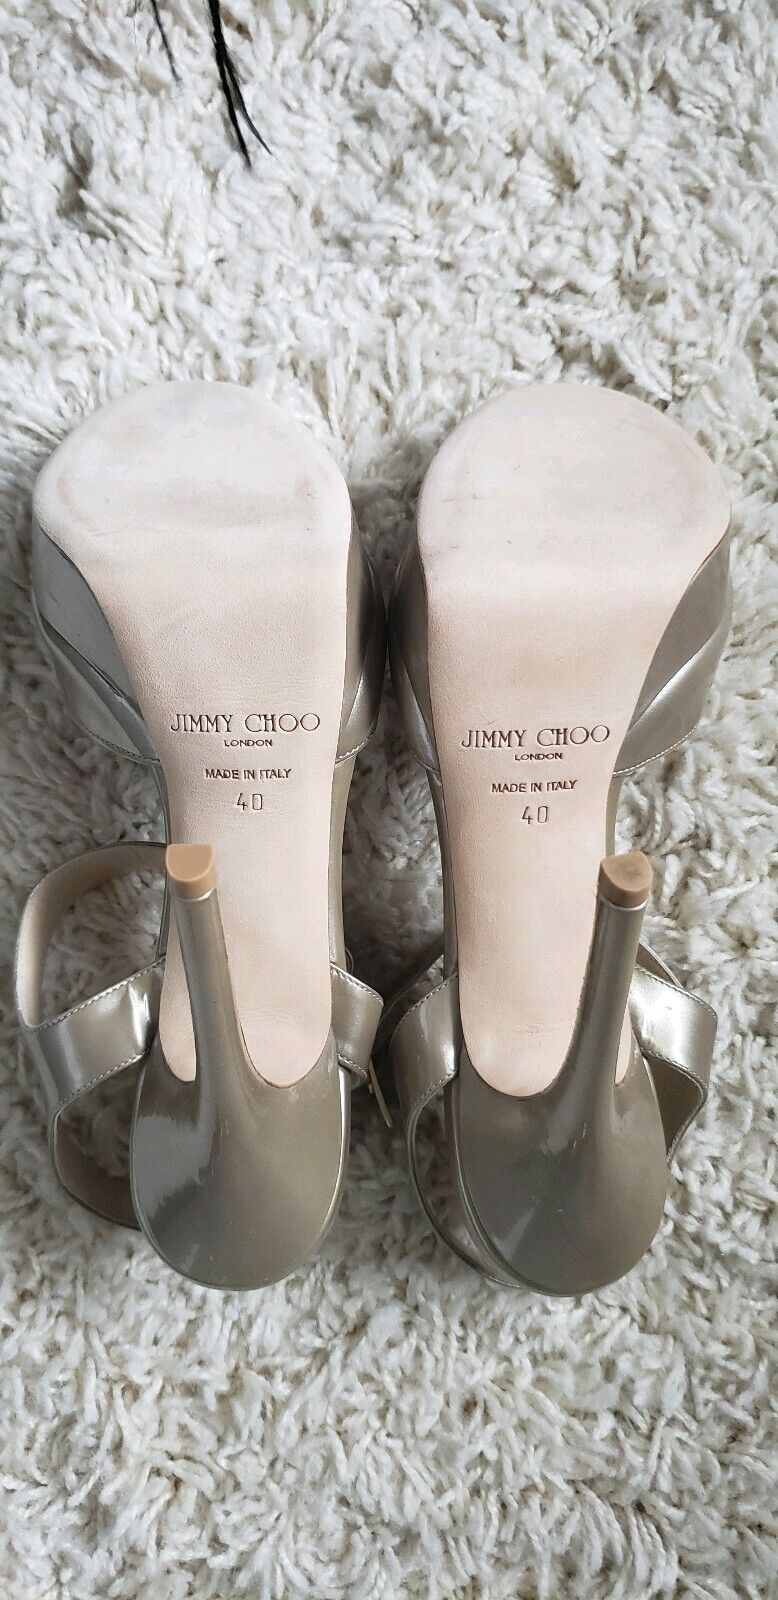 NIB Jimmy Choo Choo Choo Sandals 40 ab89e5